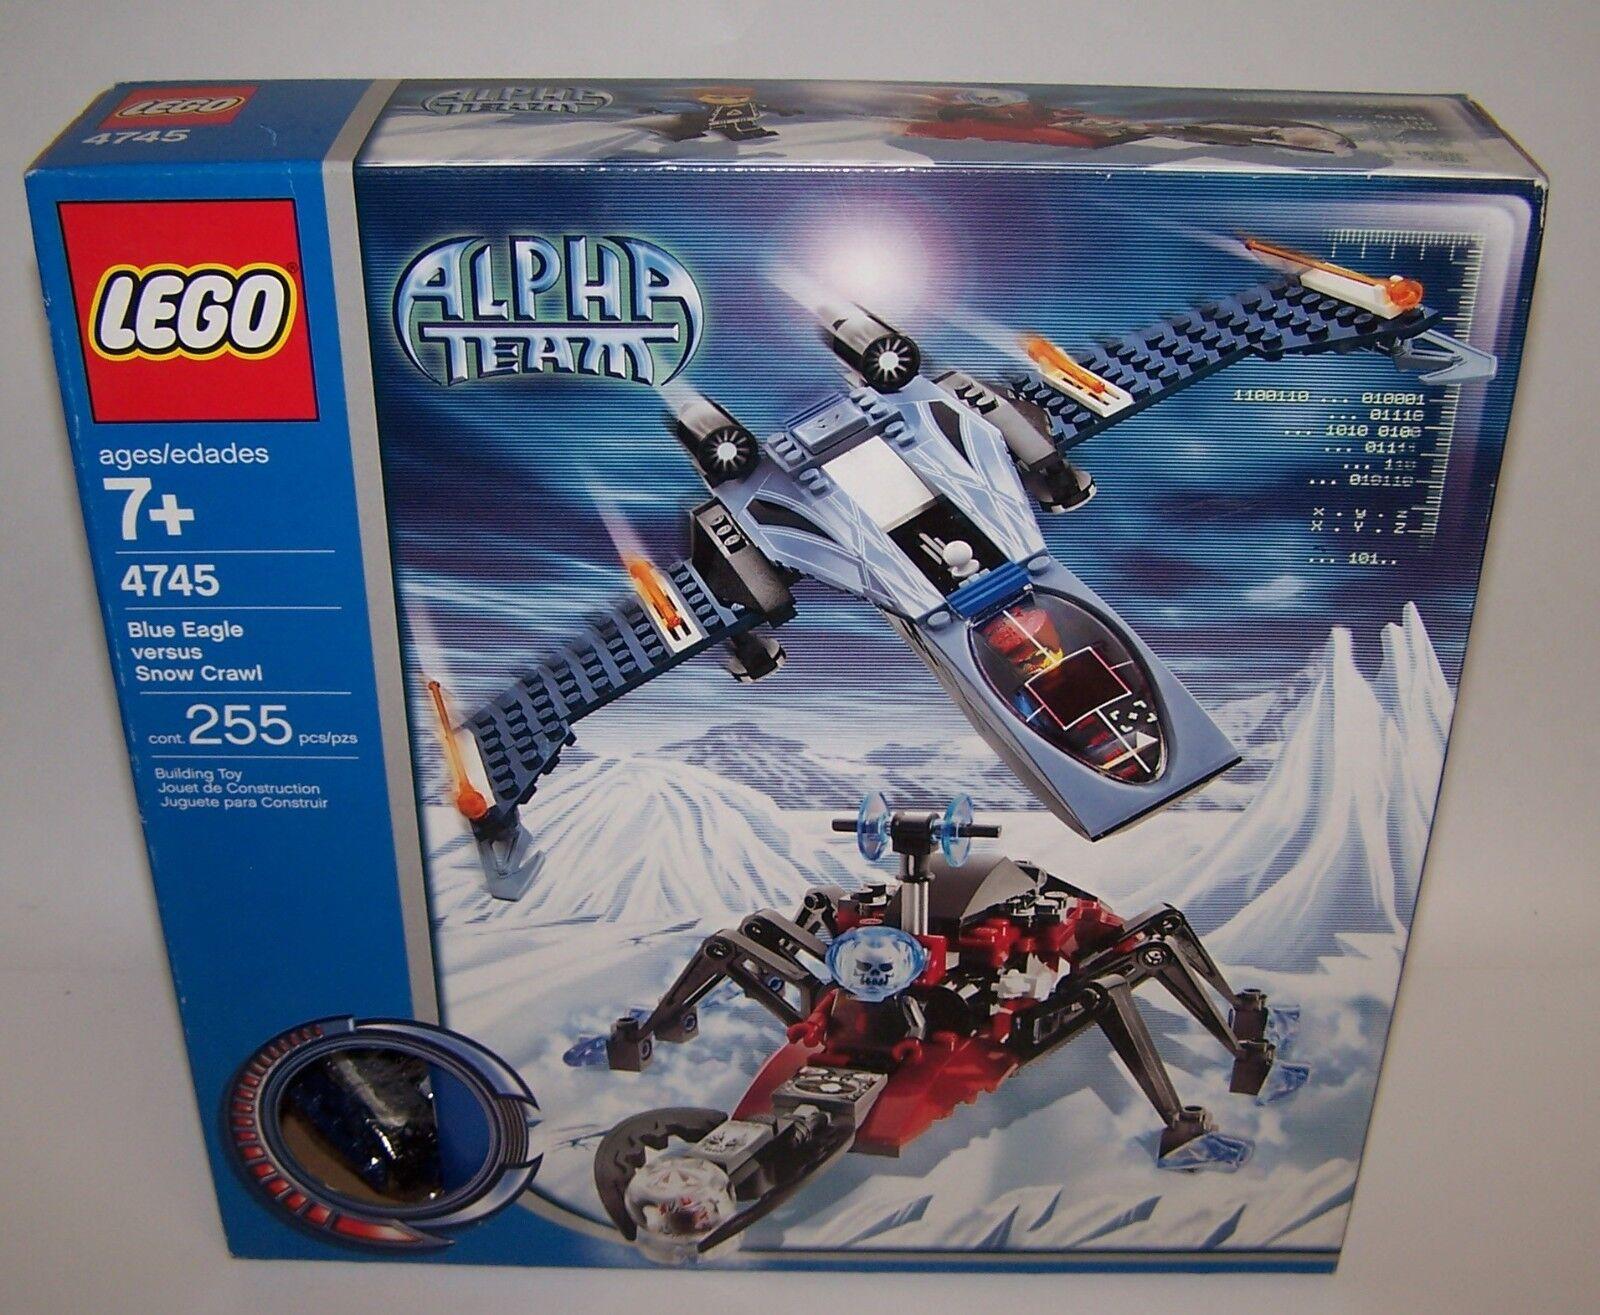 Lego 4745 Alpha Team bluee Eagle Vs Snow Crawler 225 pcs New Sealed